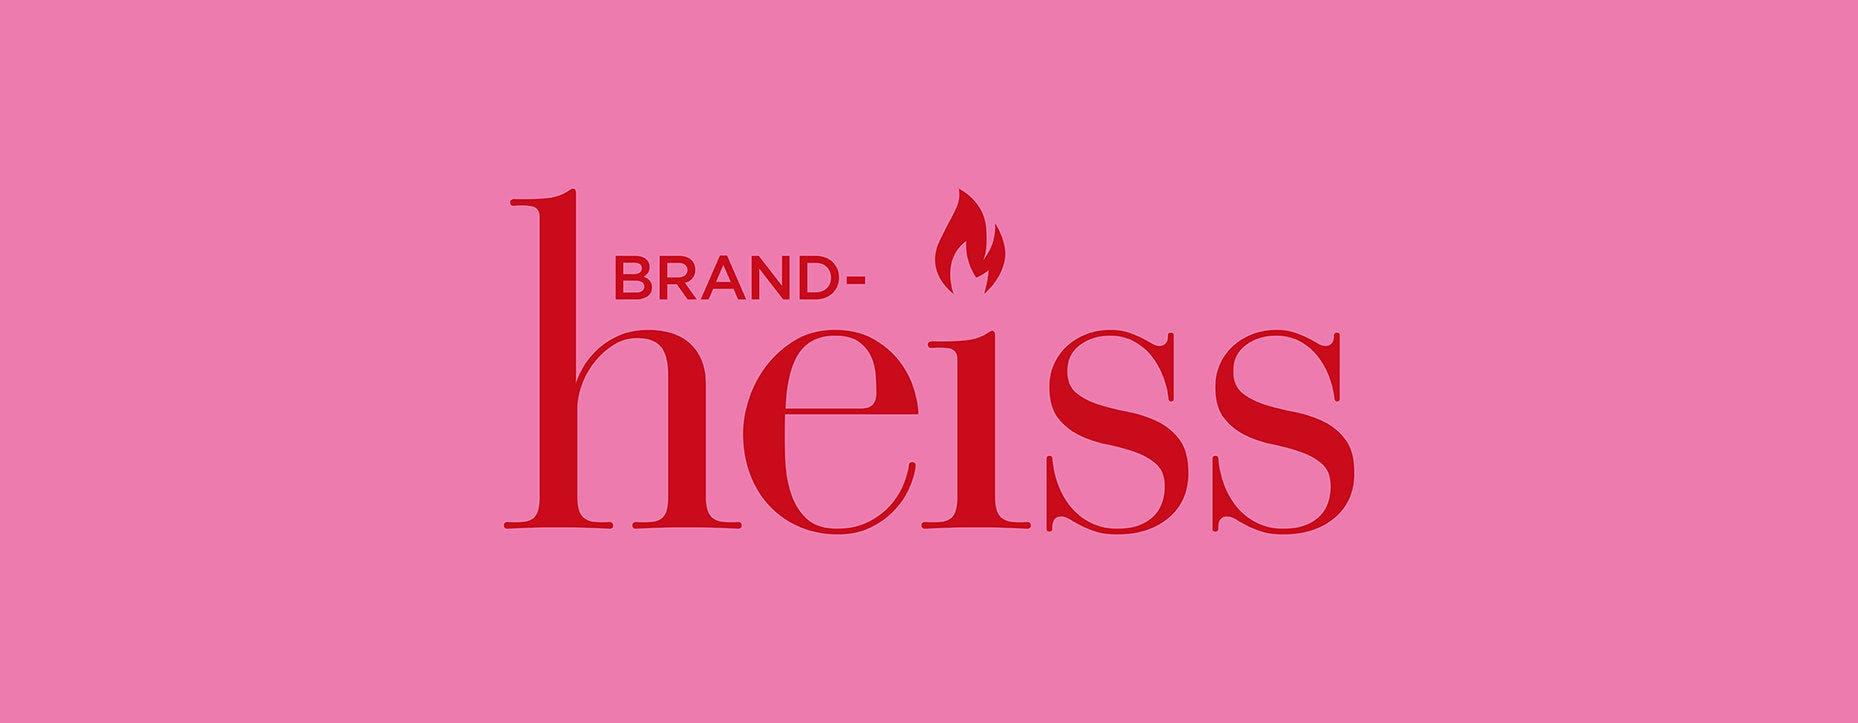 Brandheiss